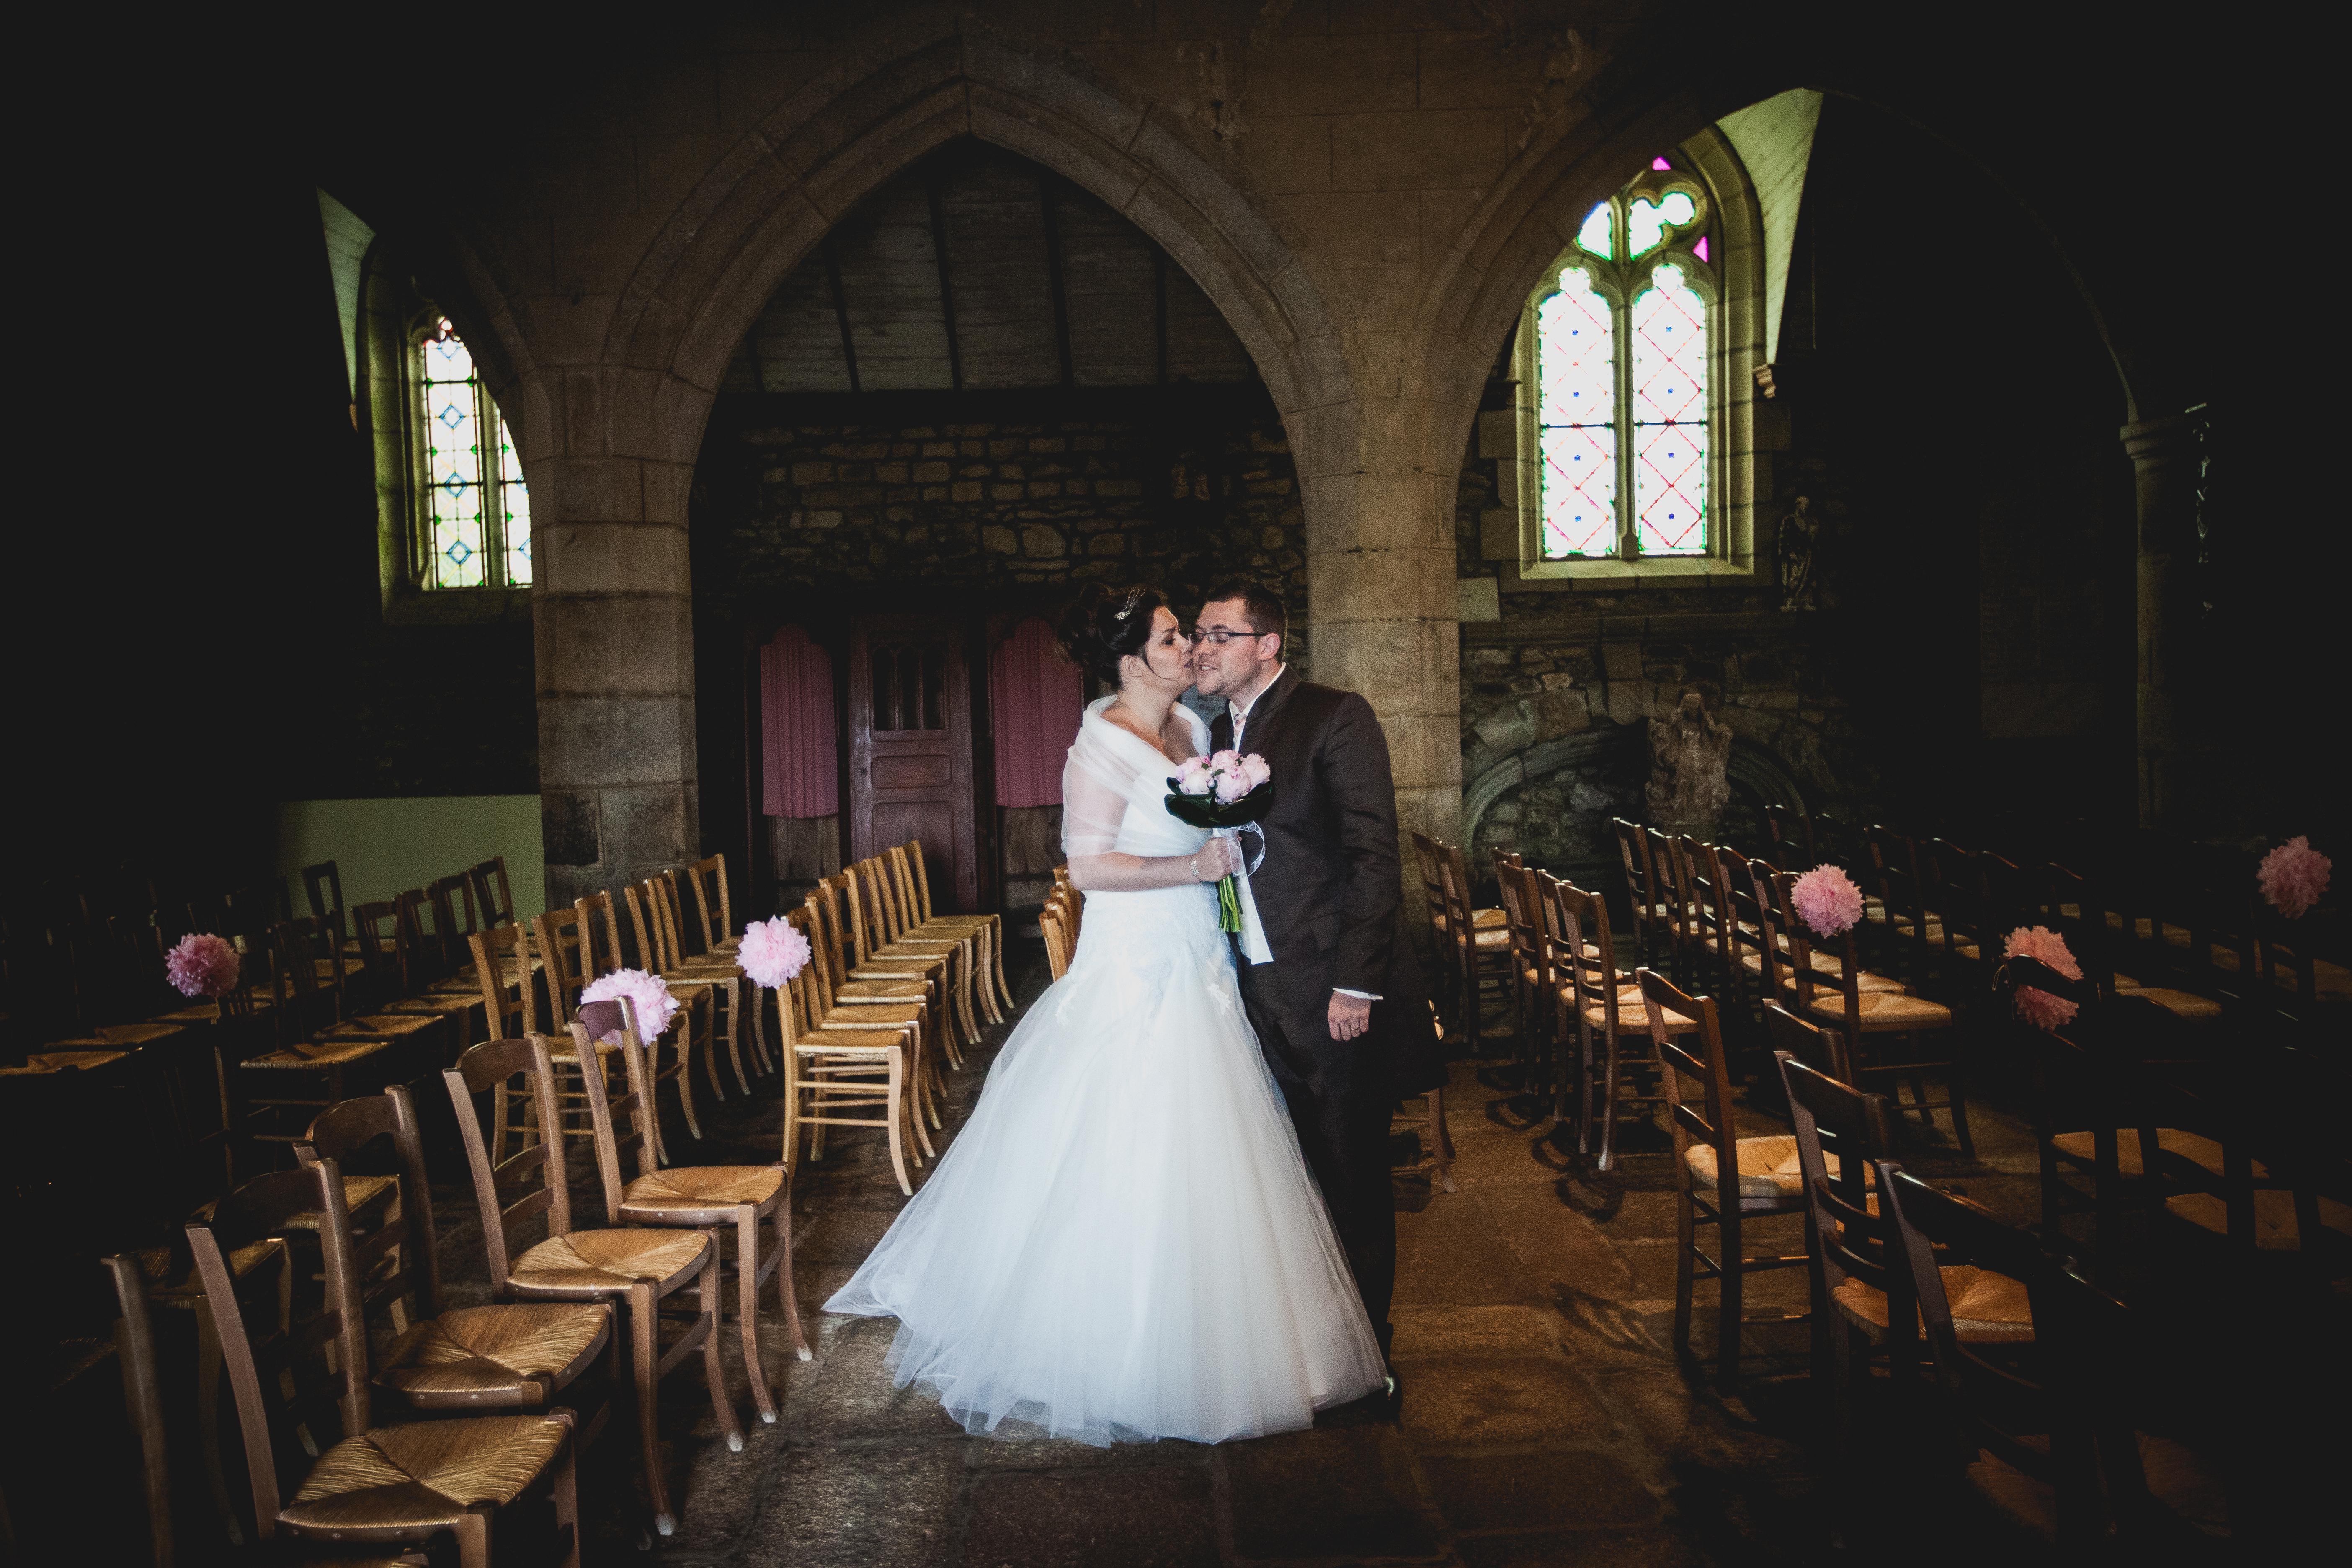 Mon mariage breton – La cérémonie religieuse